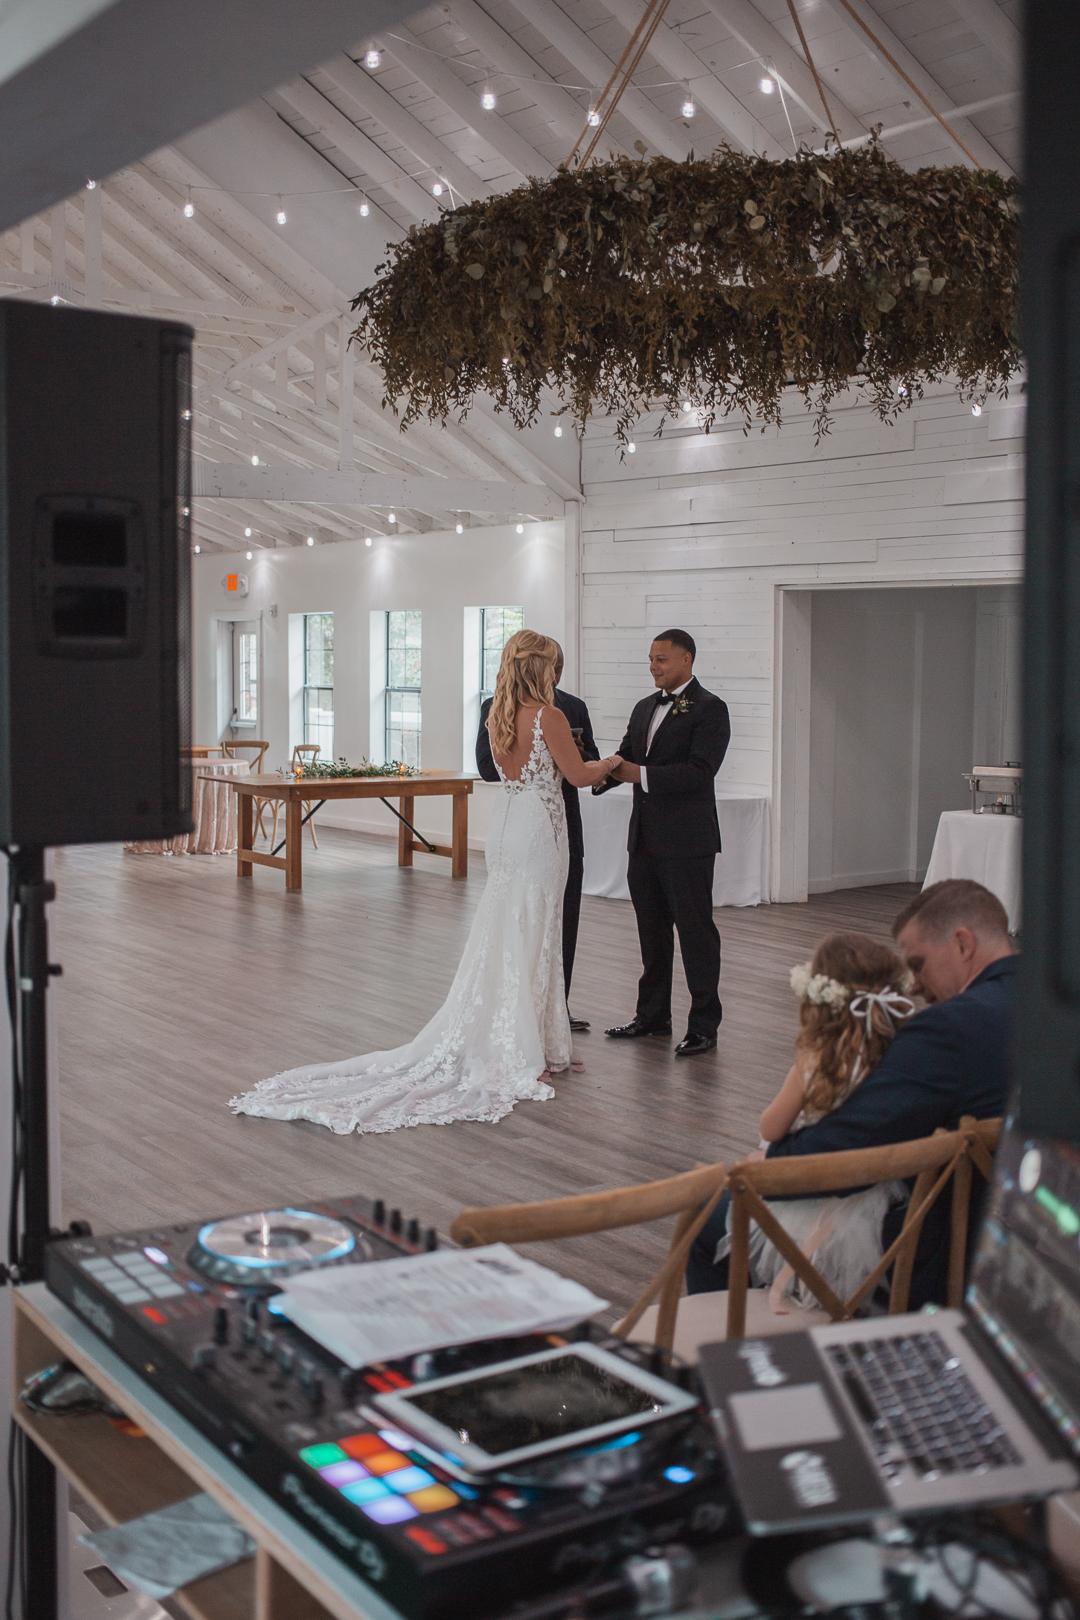 Aloson & Oree's Wedding (8-24-19) Edited5886.jpg